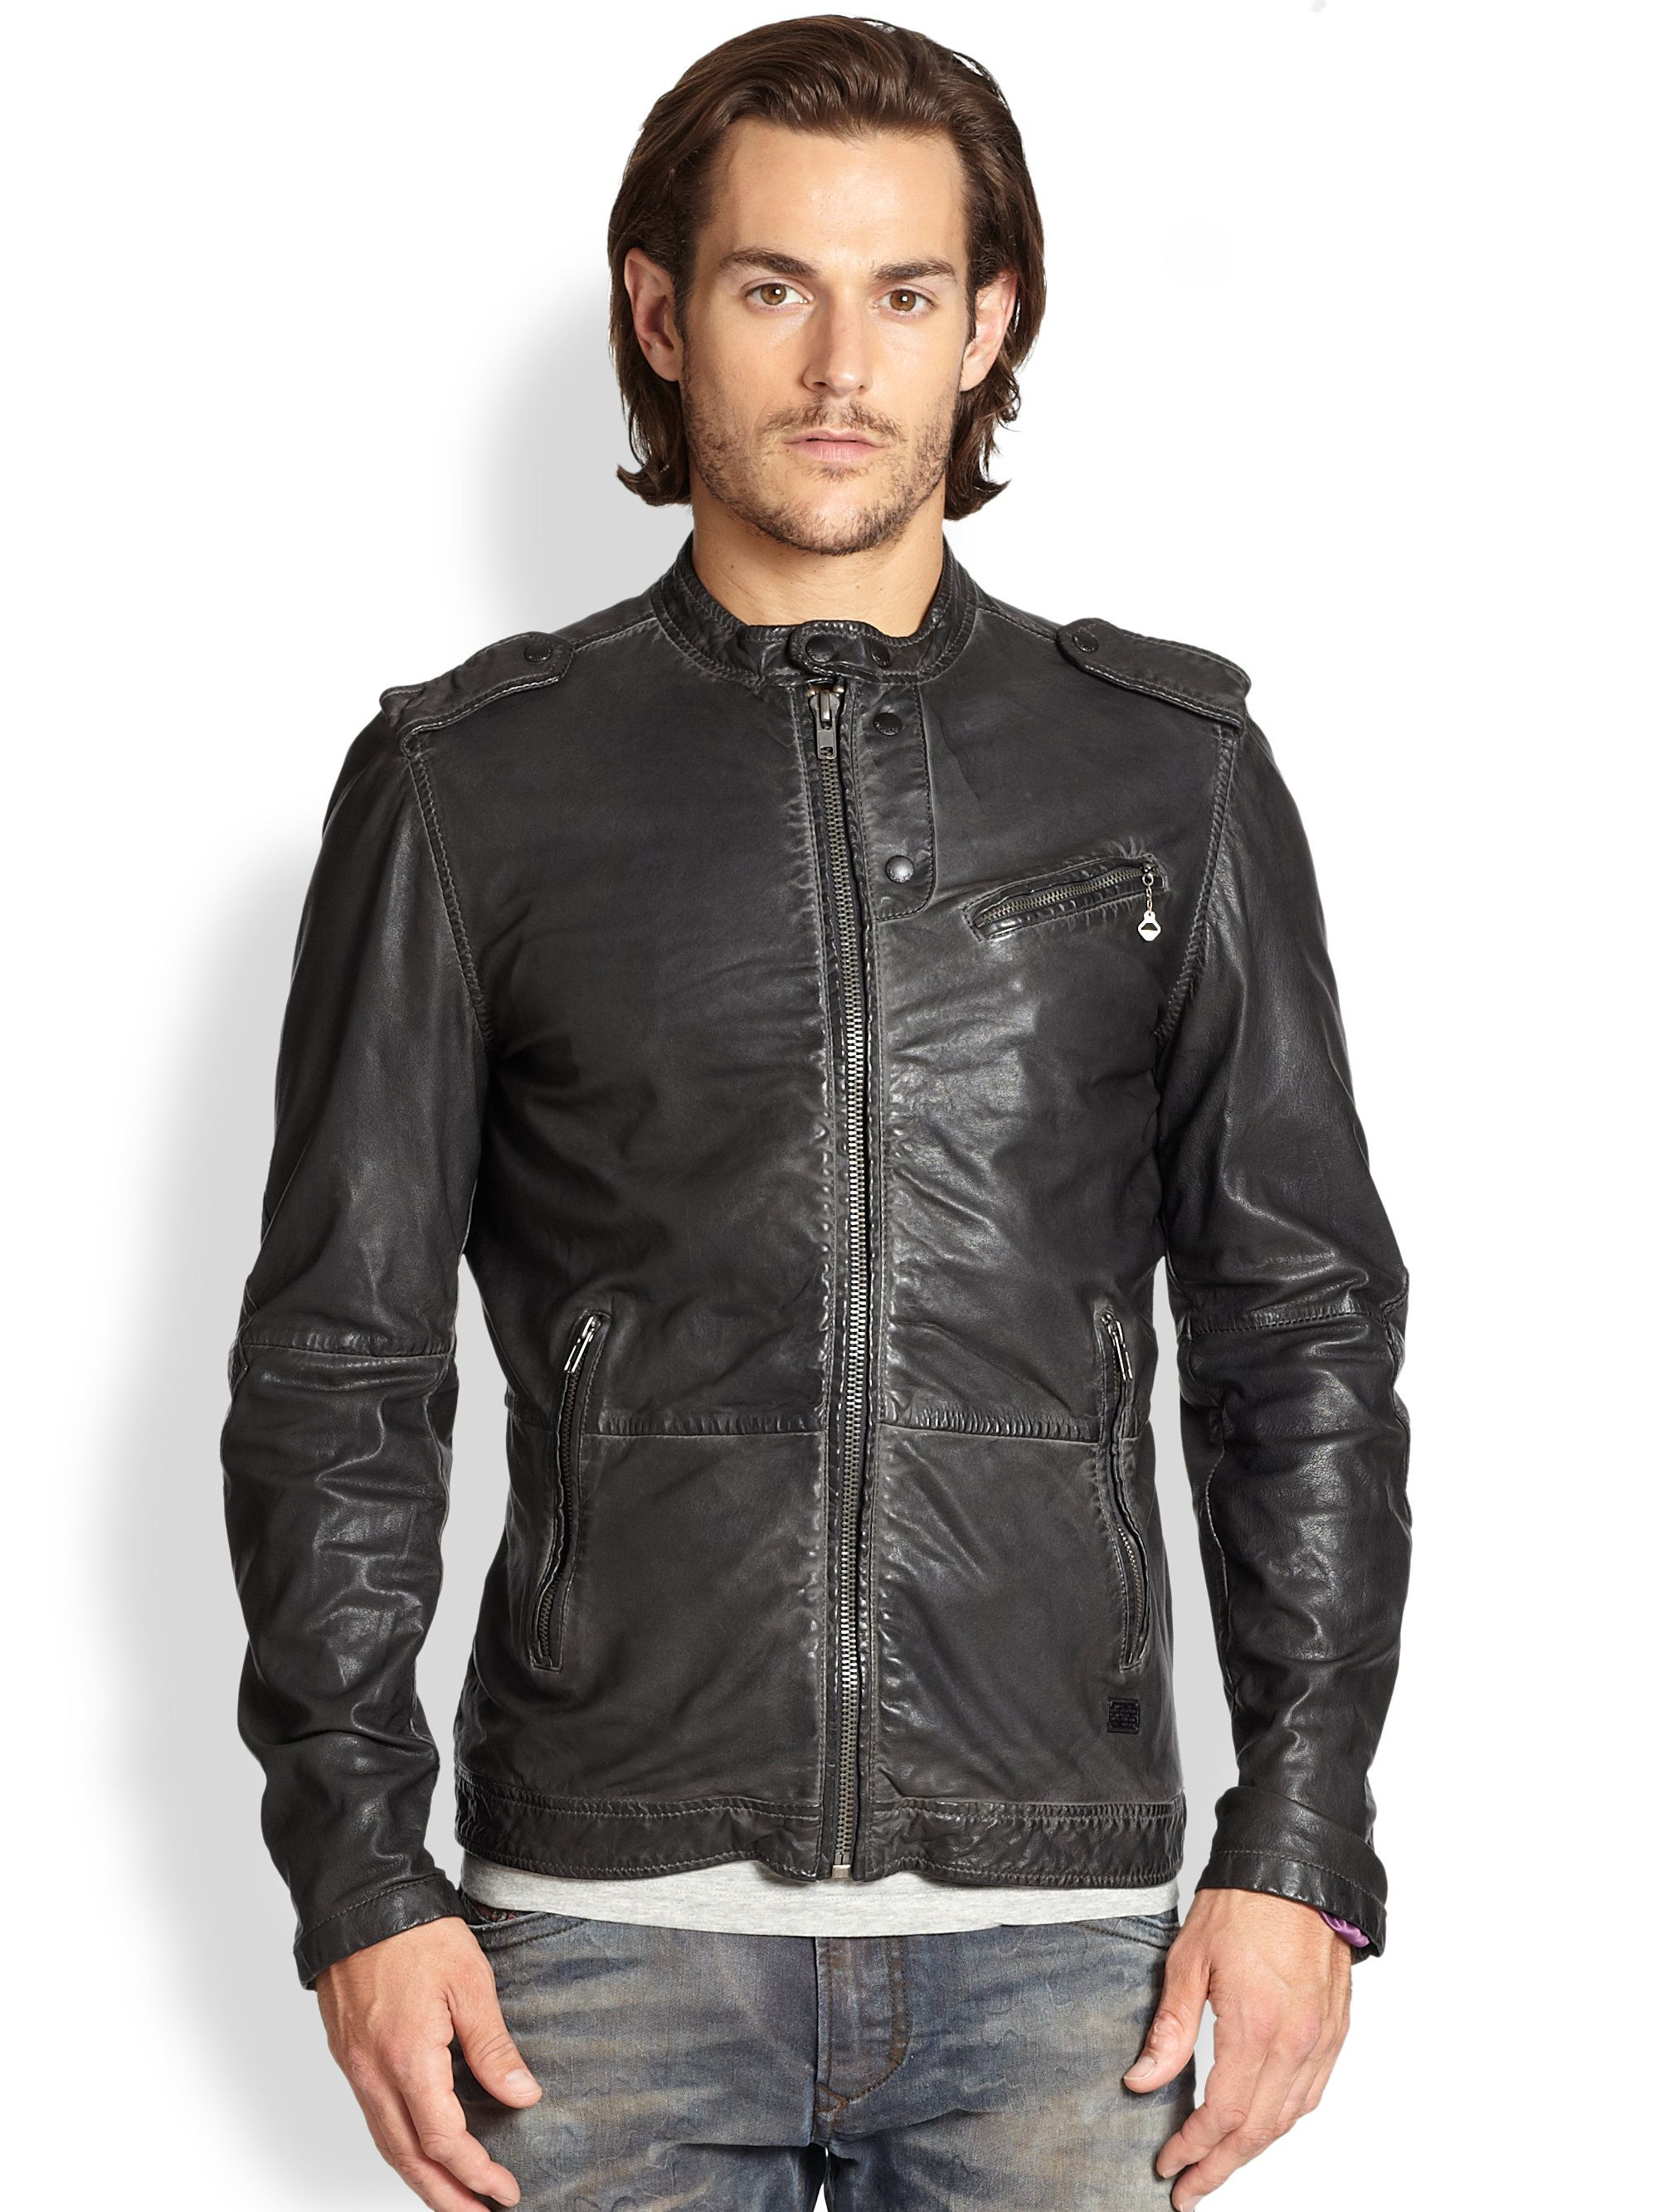 Diesel Leprandis Leather Biker Jacket in Black for Men